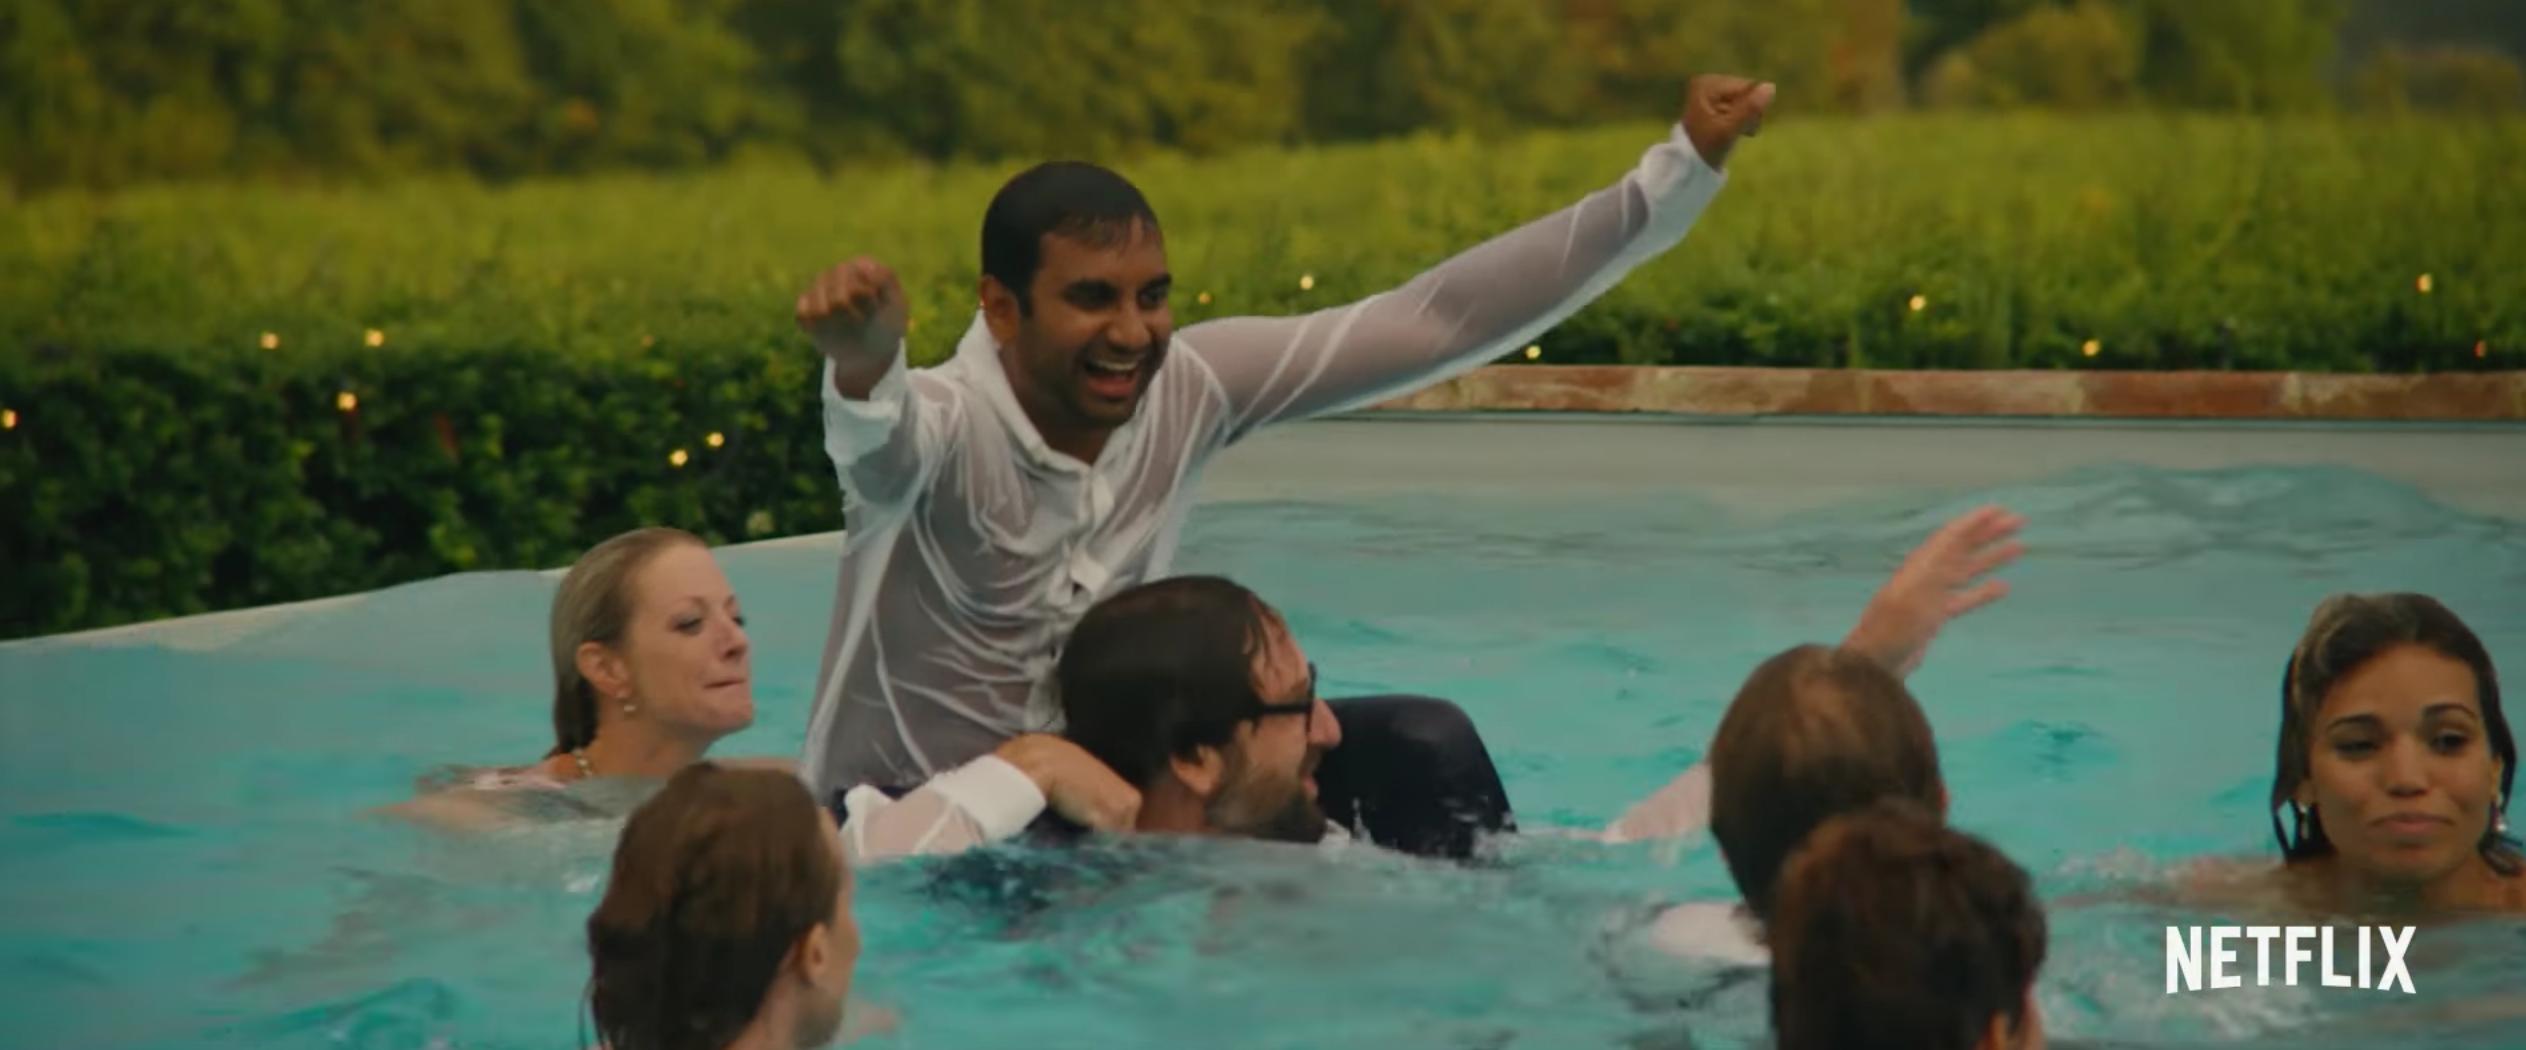 Aziz Ansari shares trailer for second season of 'Master of None'